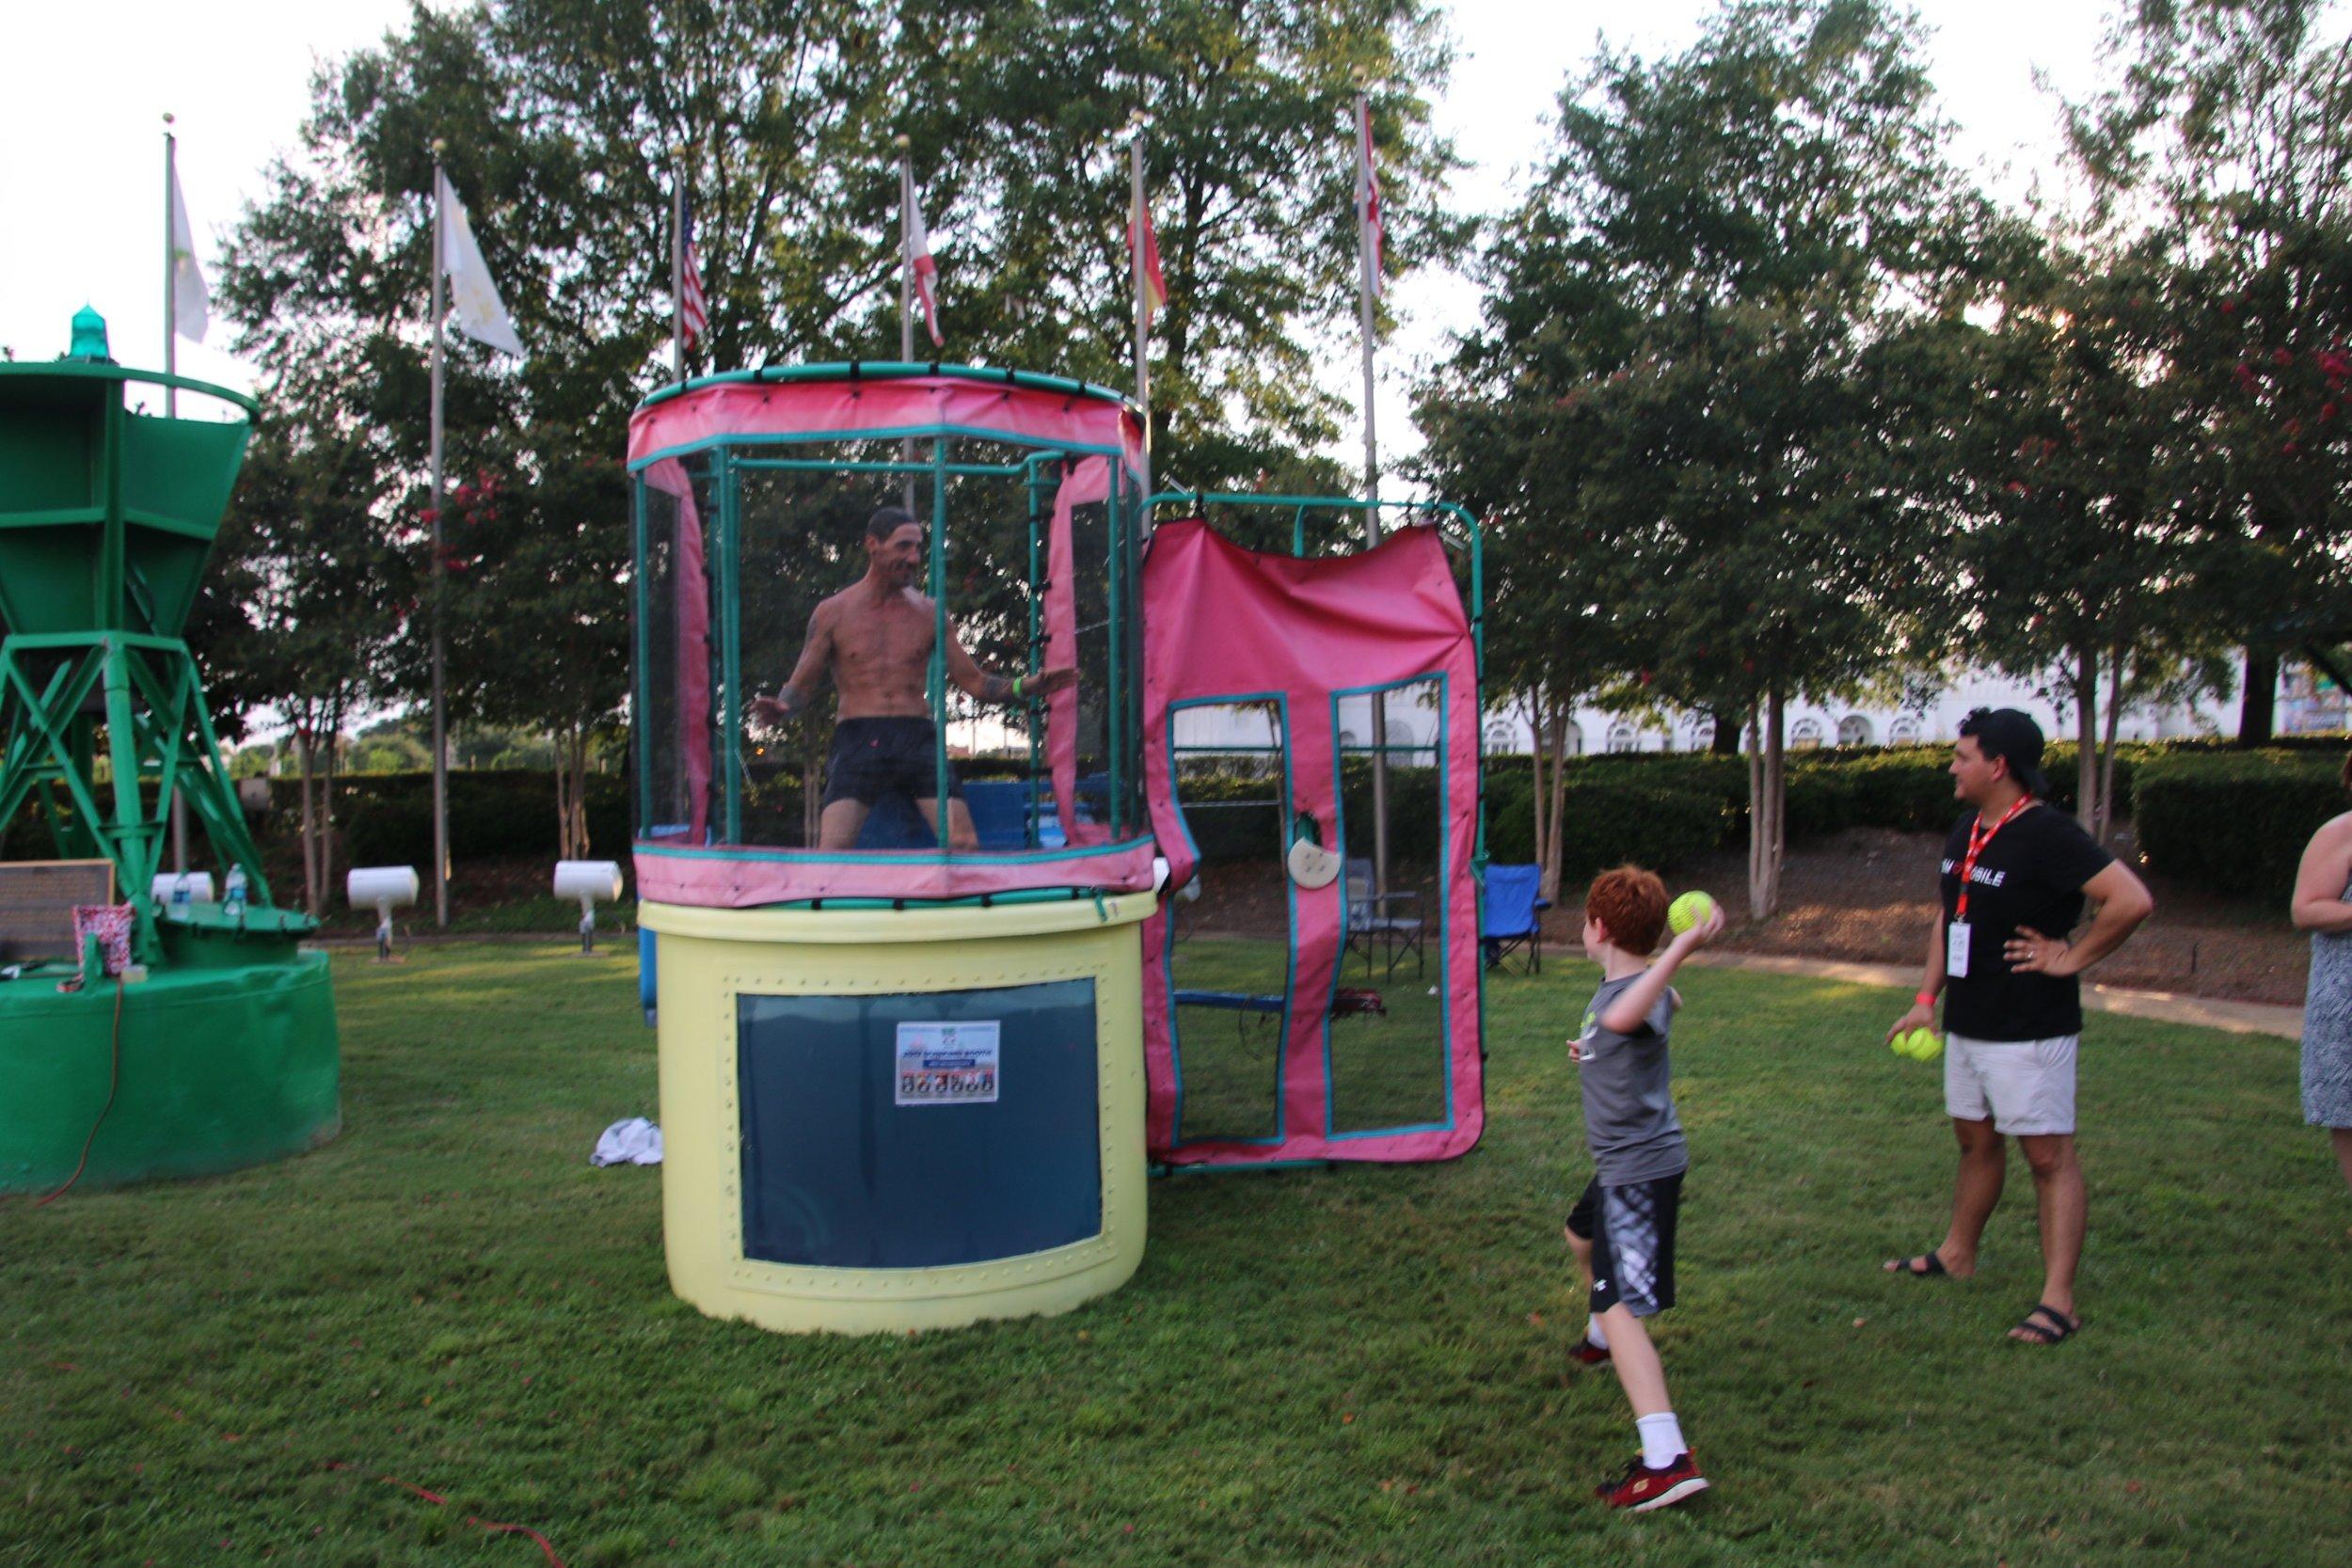 Dunk Booth Kid Throwing.jpg